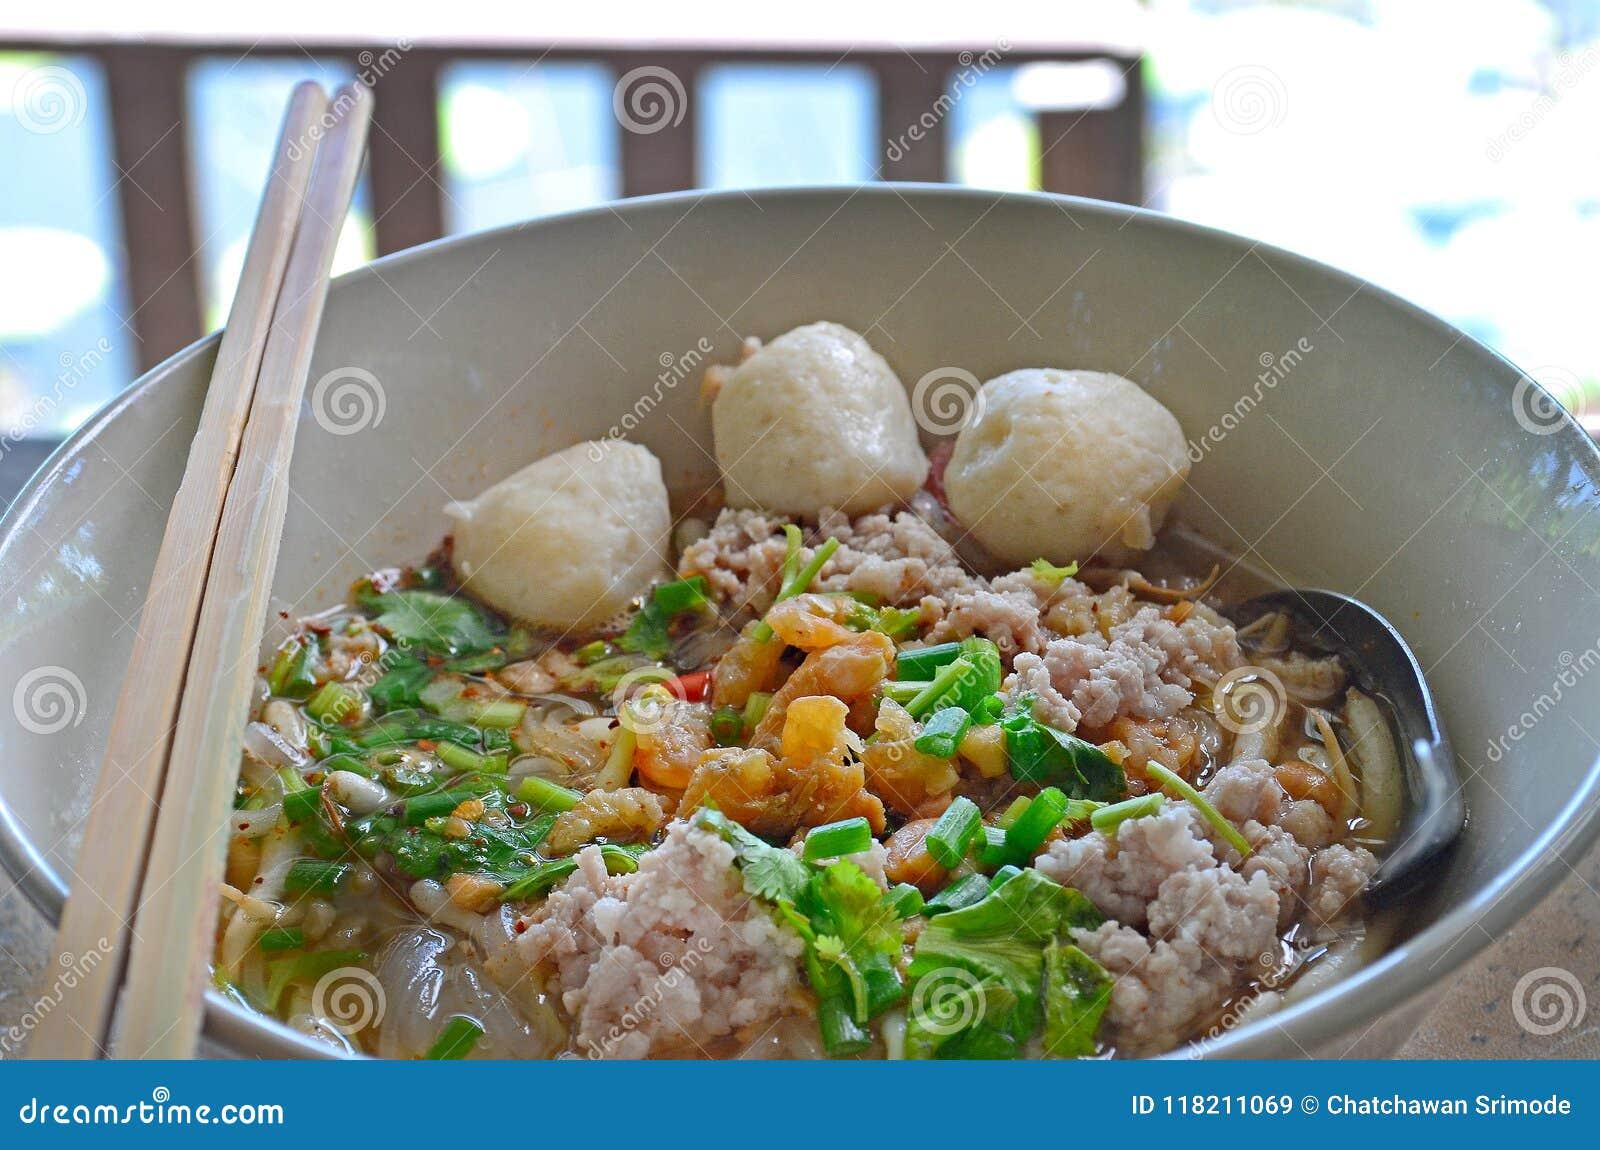 Thai Pork Noodle In White Bowl Stock Image - Image of thai